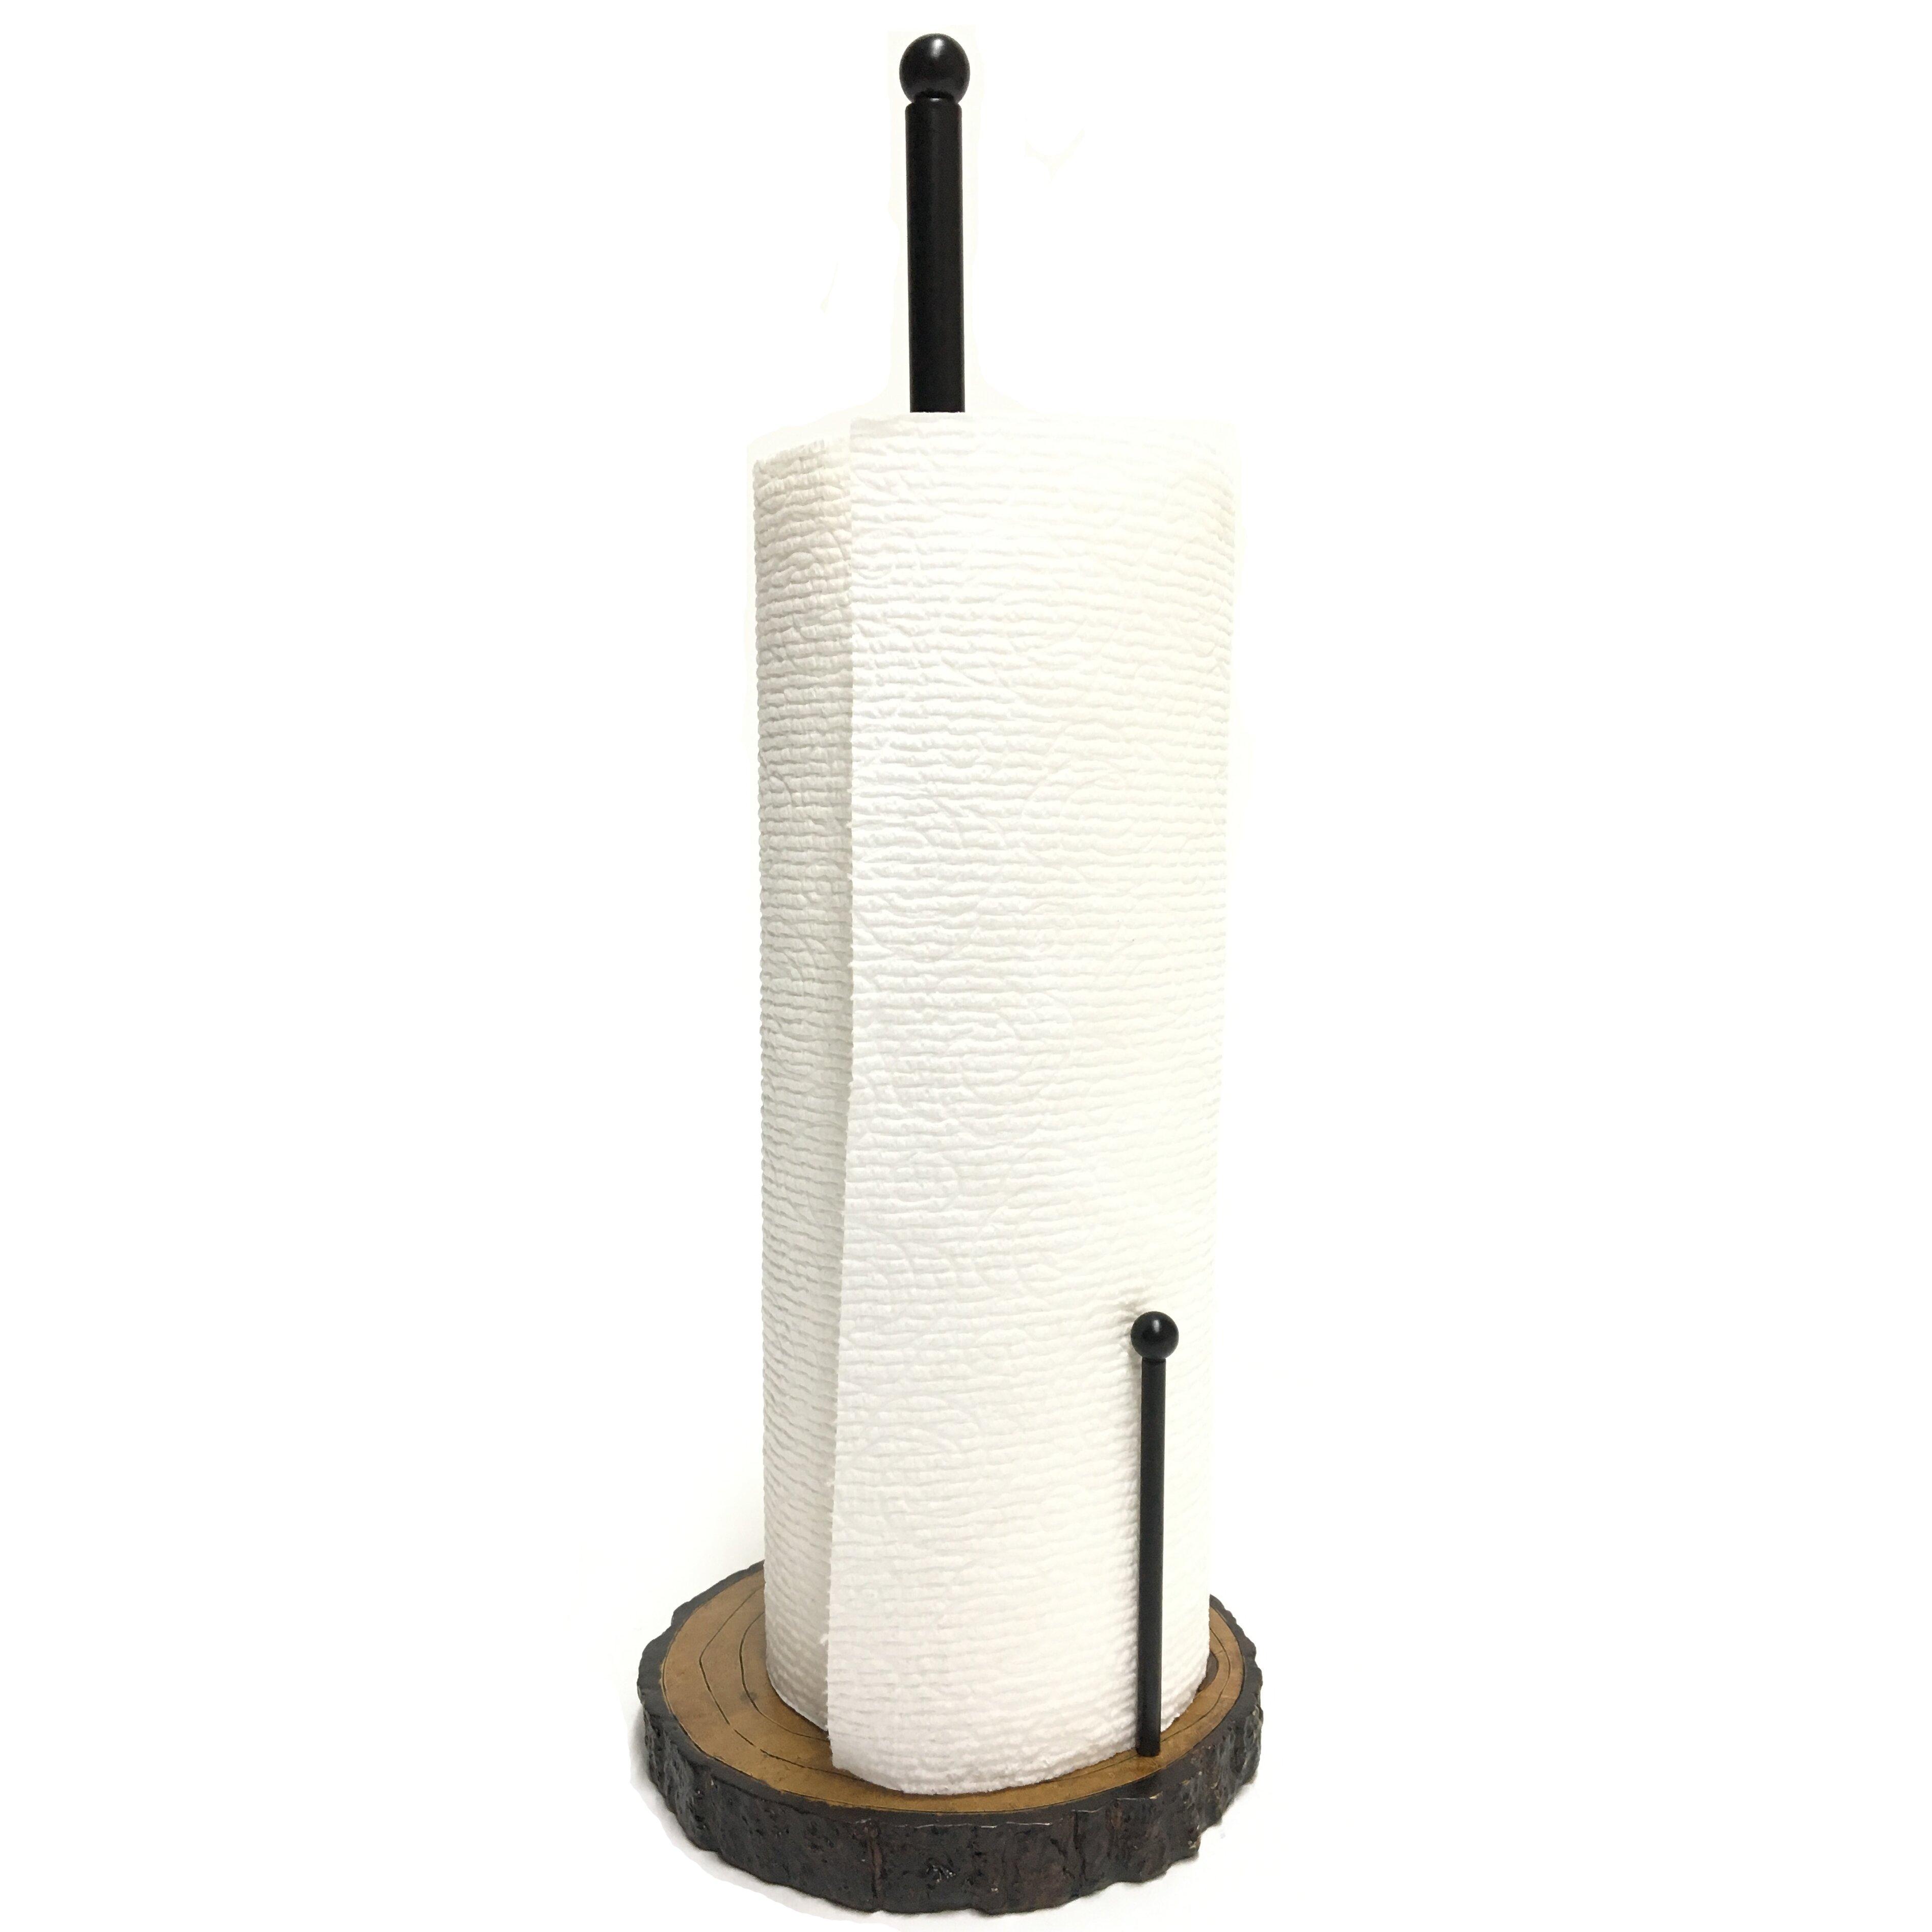 Superiore Livello Paper Towel Holder Wayfair